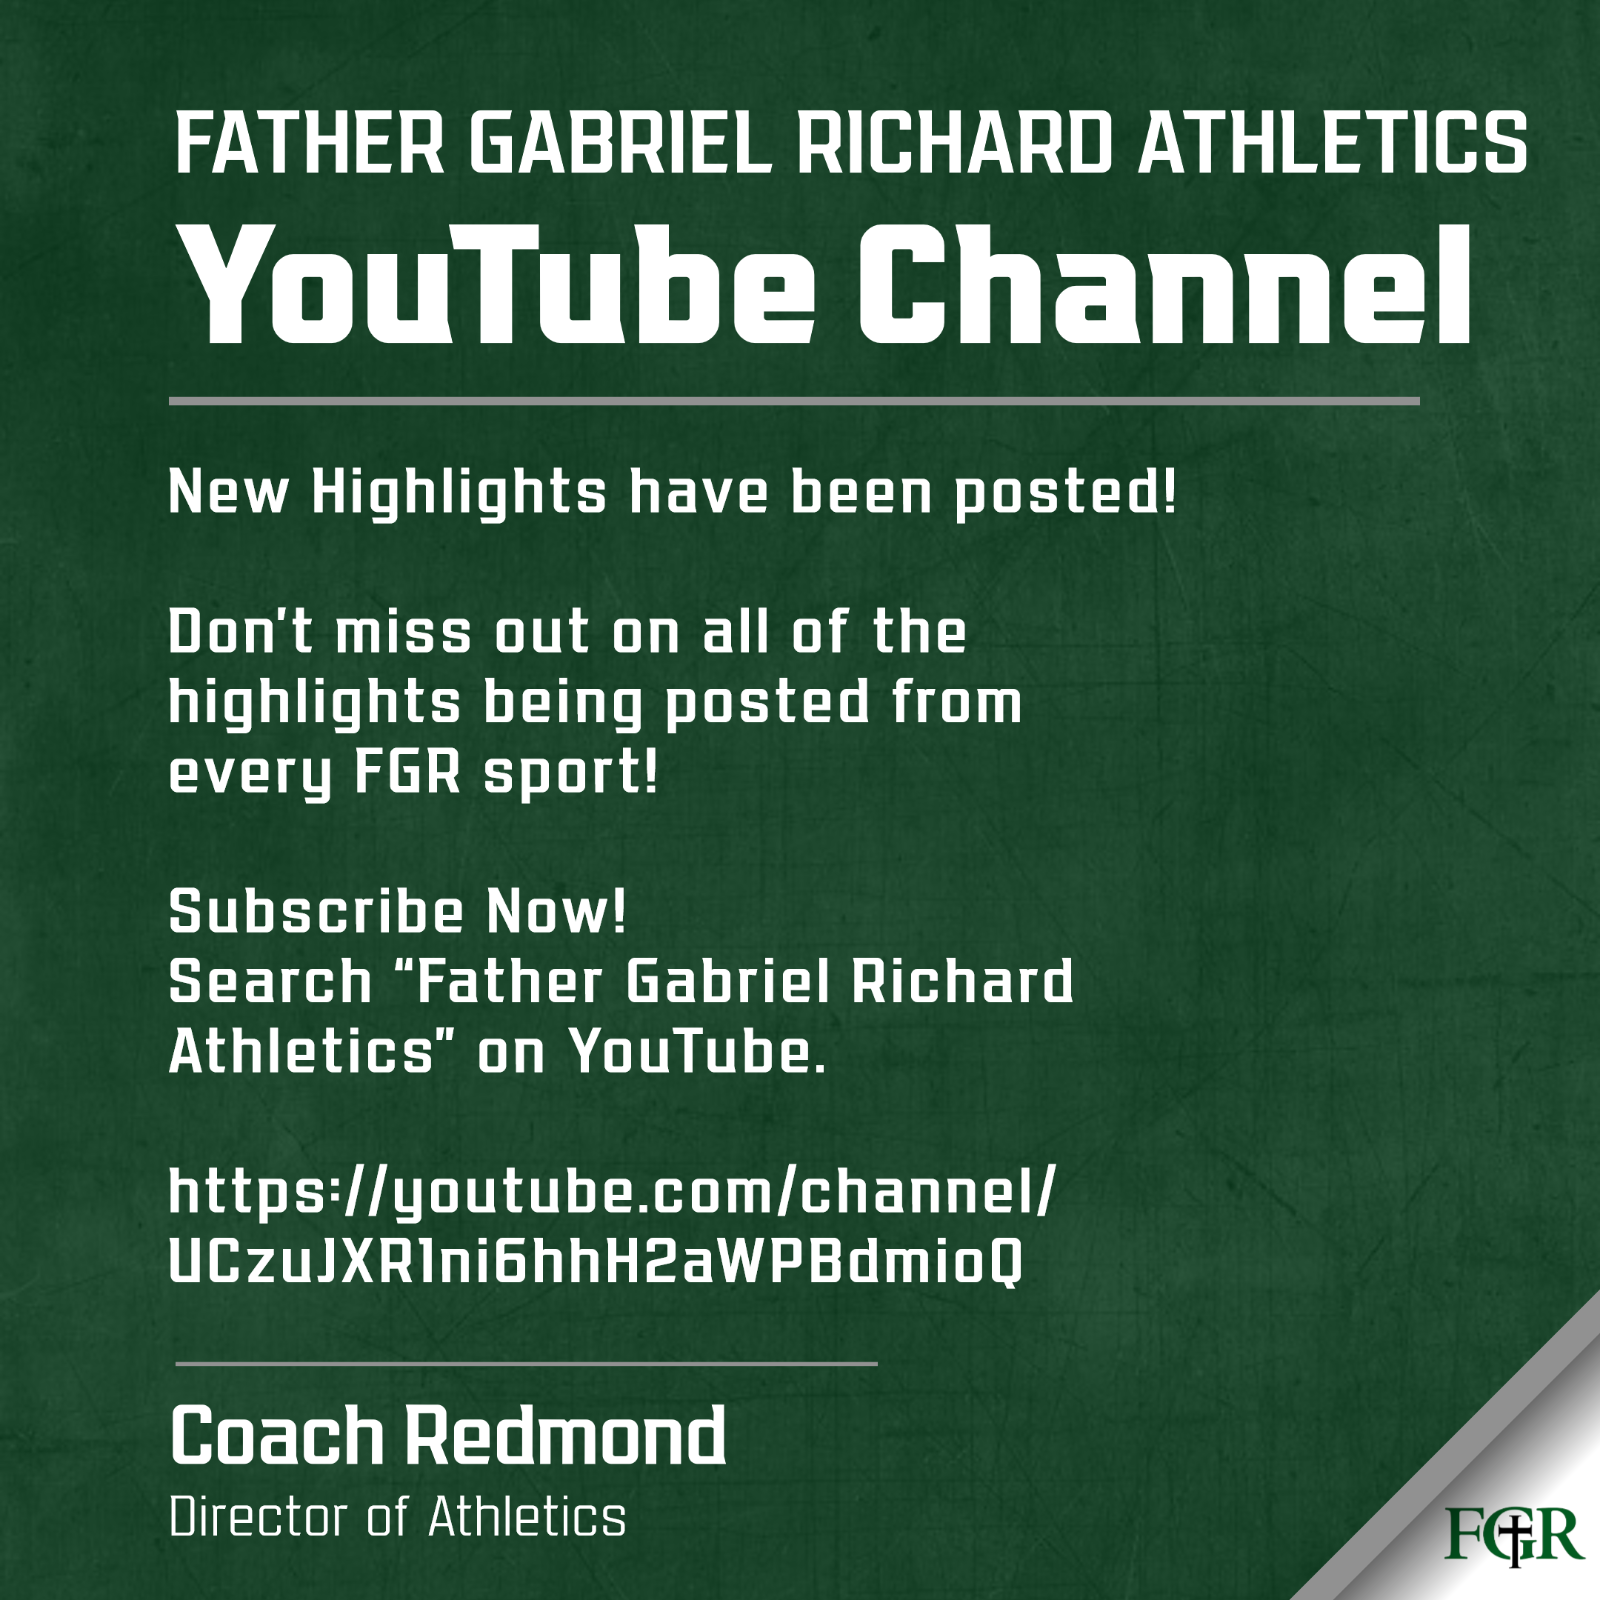 Live-stream All Home Basketball Games